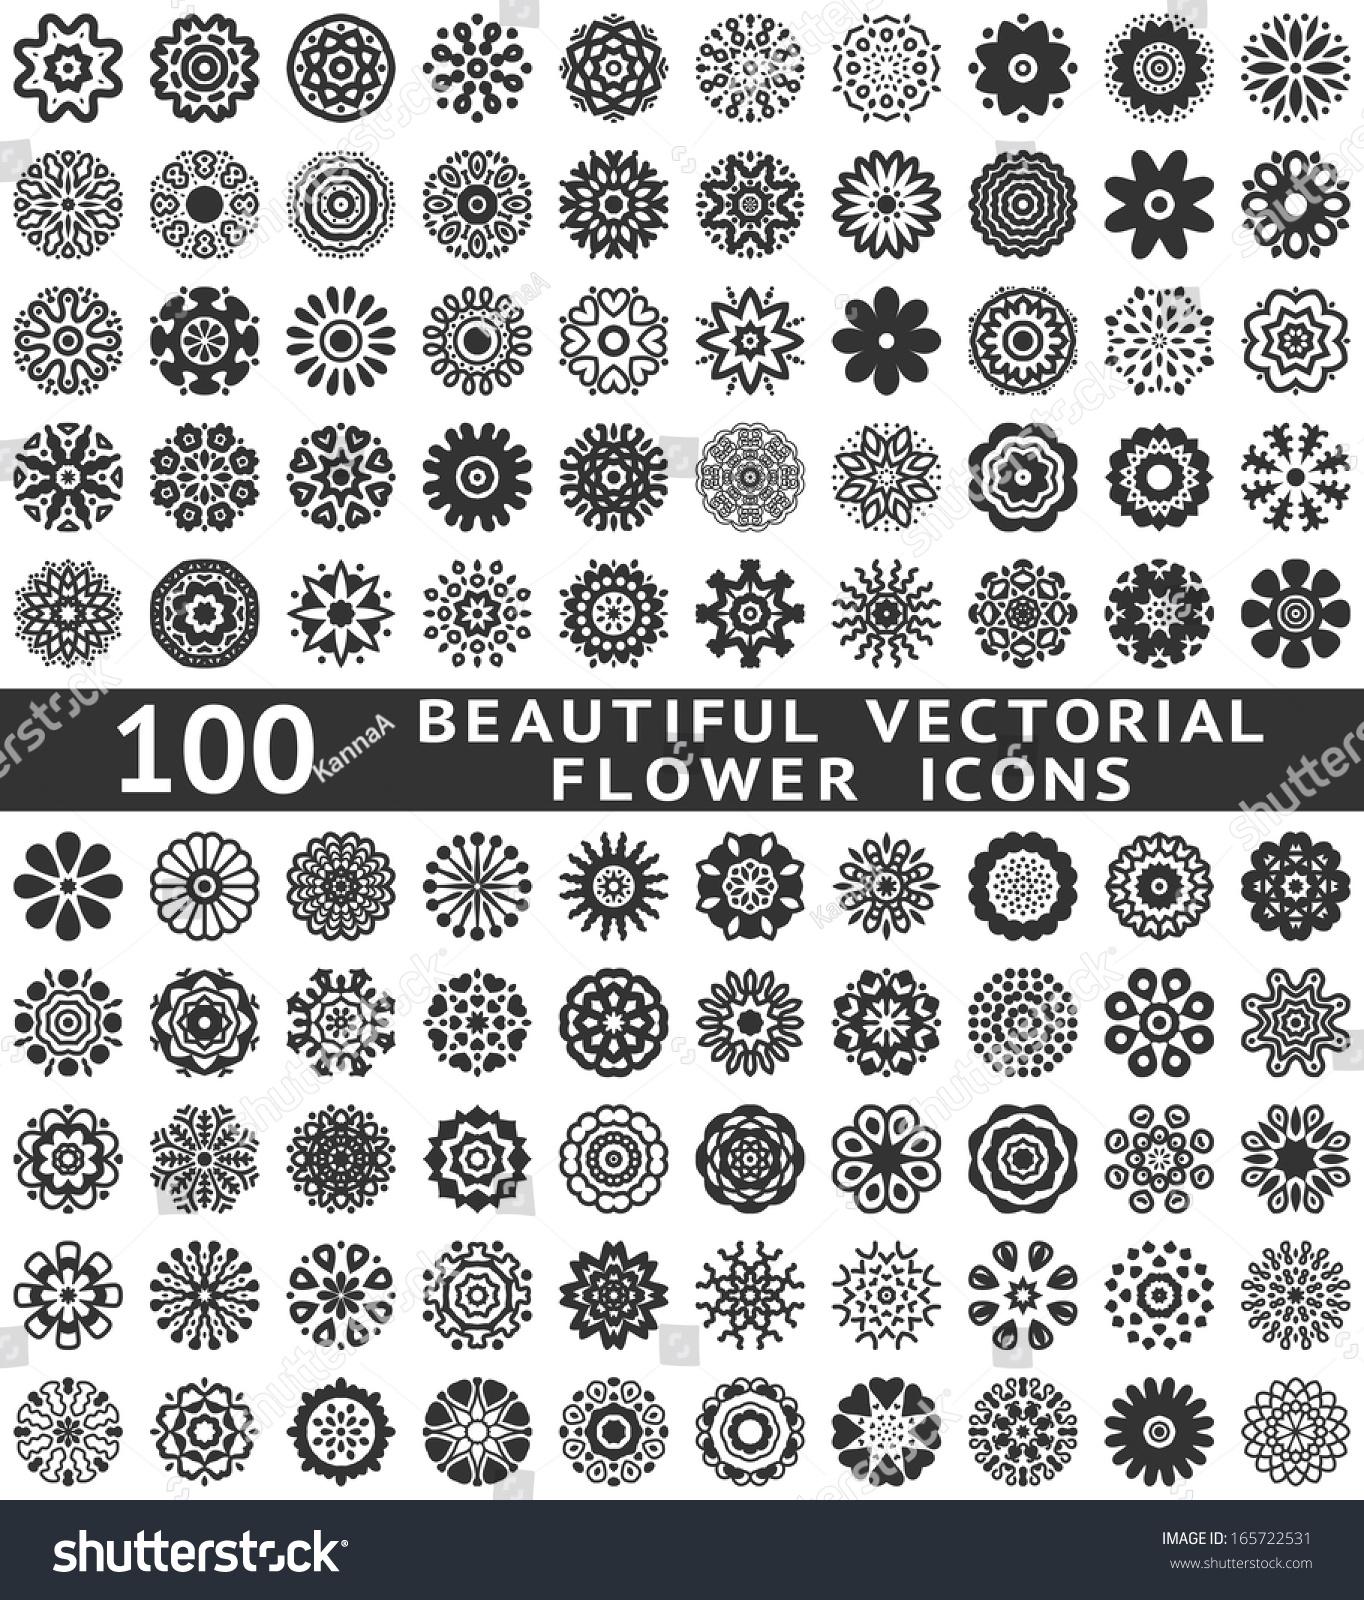 100 Beautiful Designer Bedrooms: 100 Beautiful Abstract Flower Icons Vector Stock Vector